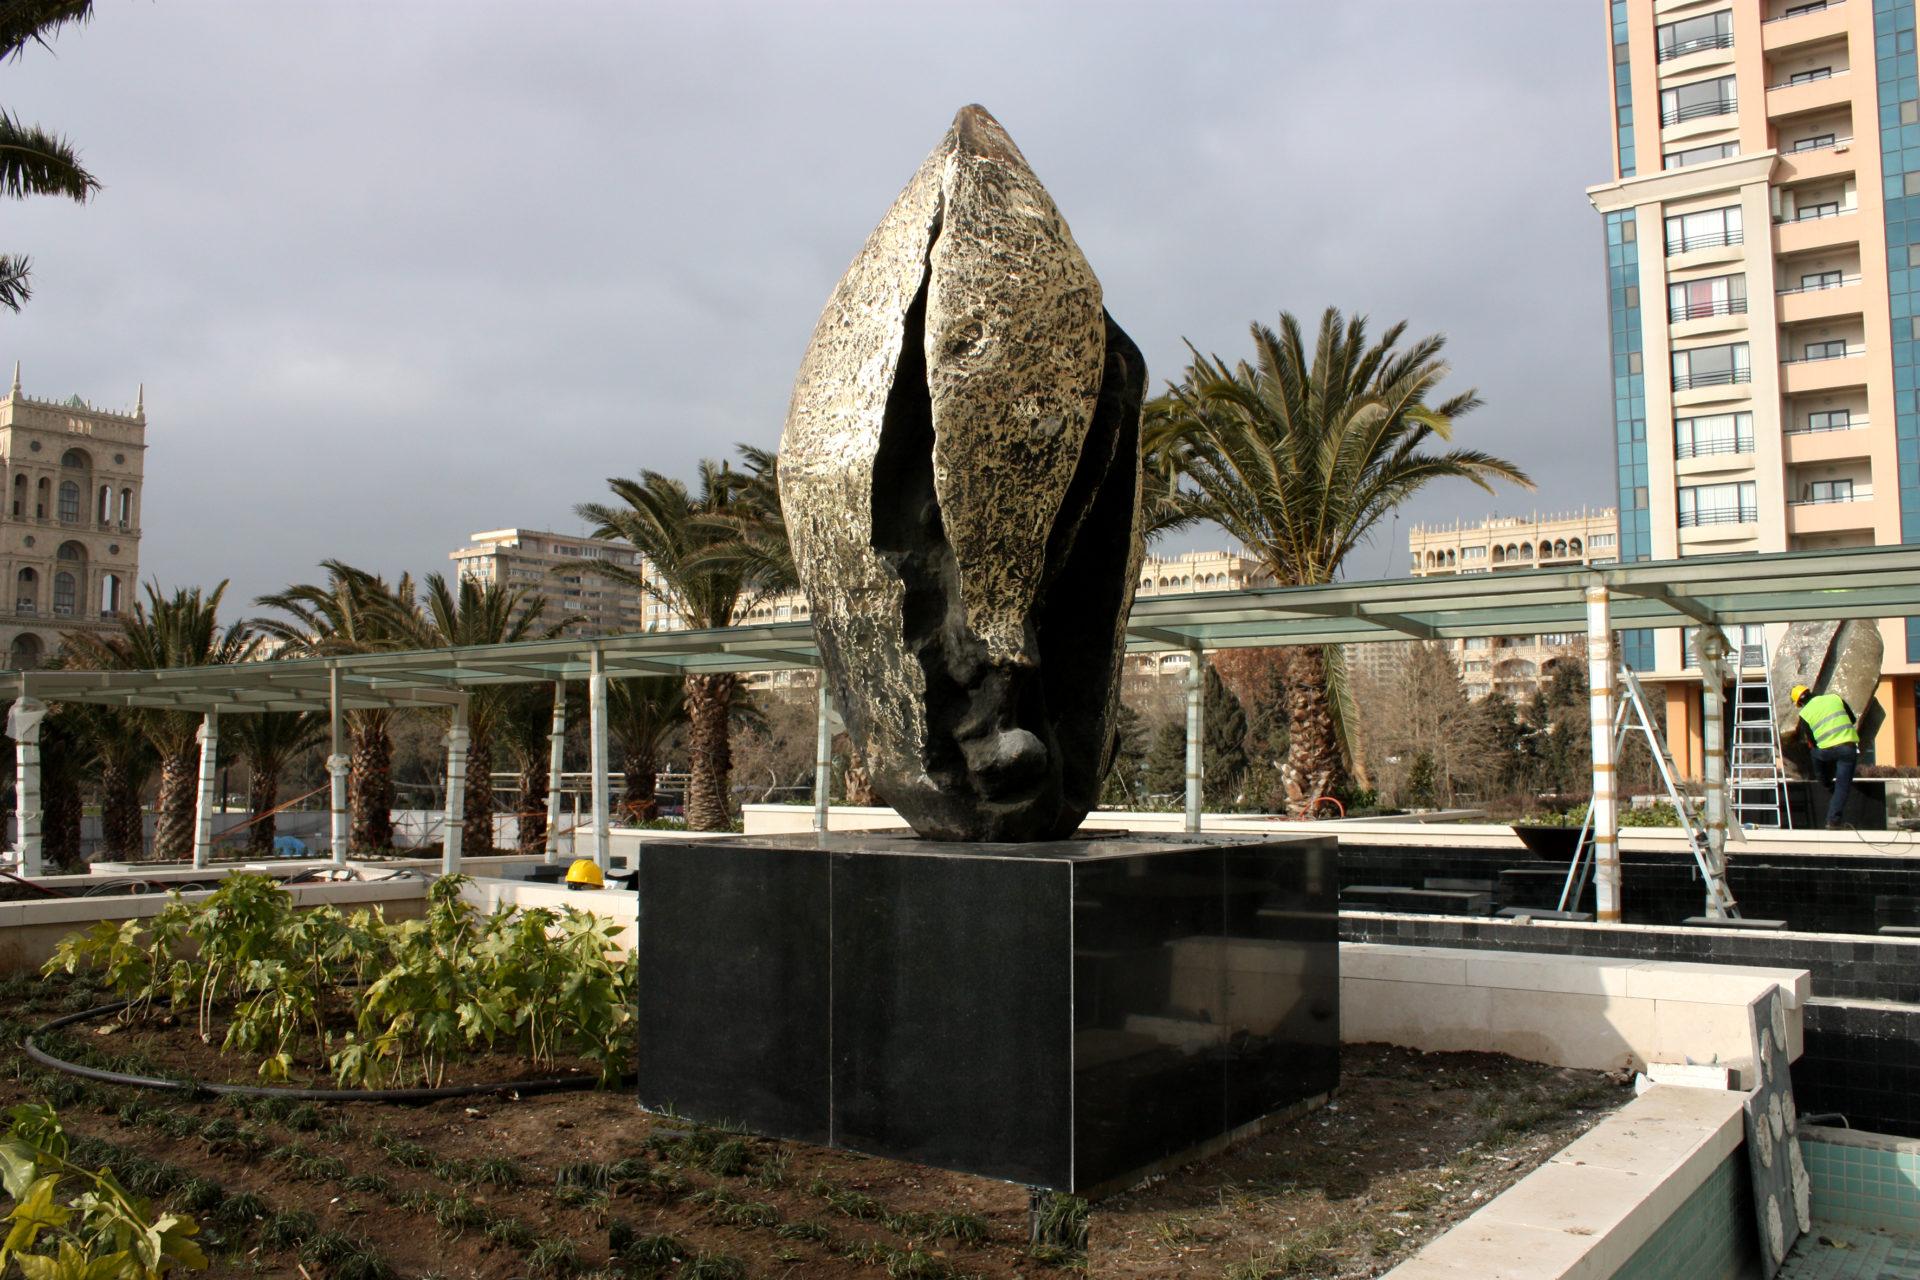 JW MARRIOTT HOTEL « Absheron Lights » 240 x 150 x 180 bronze